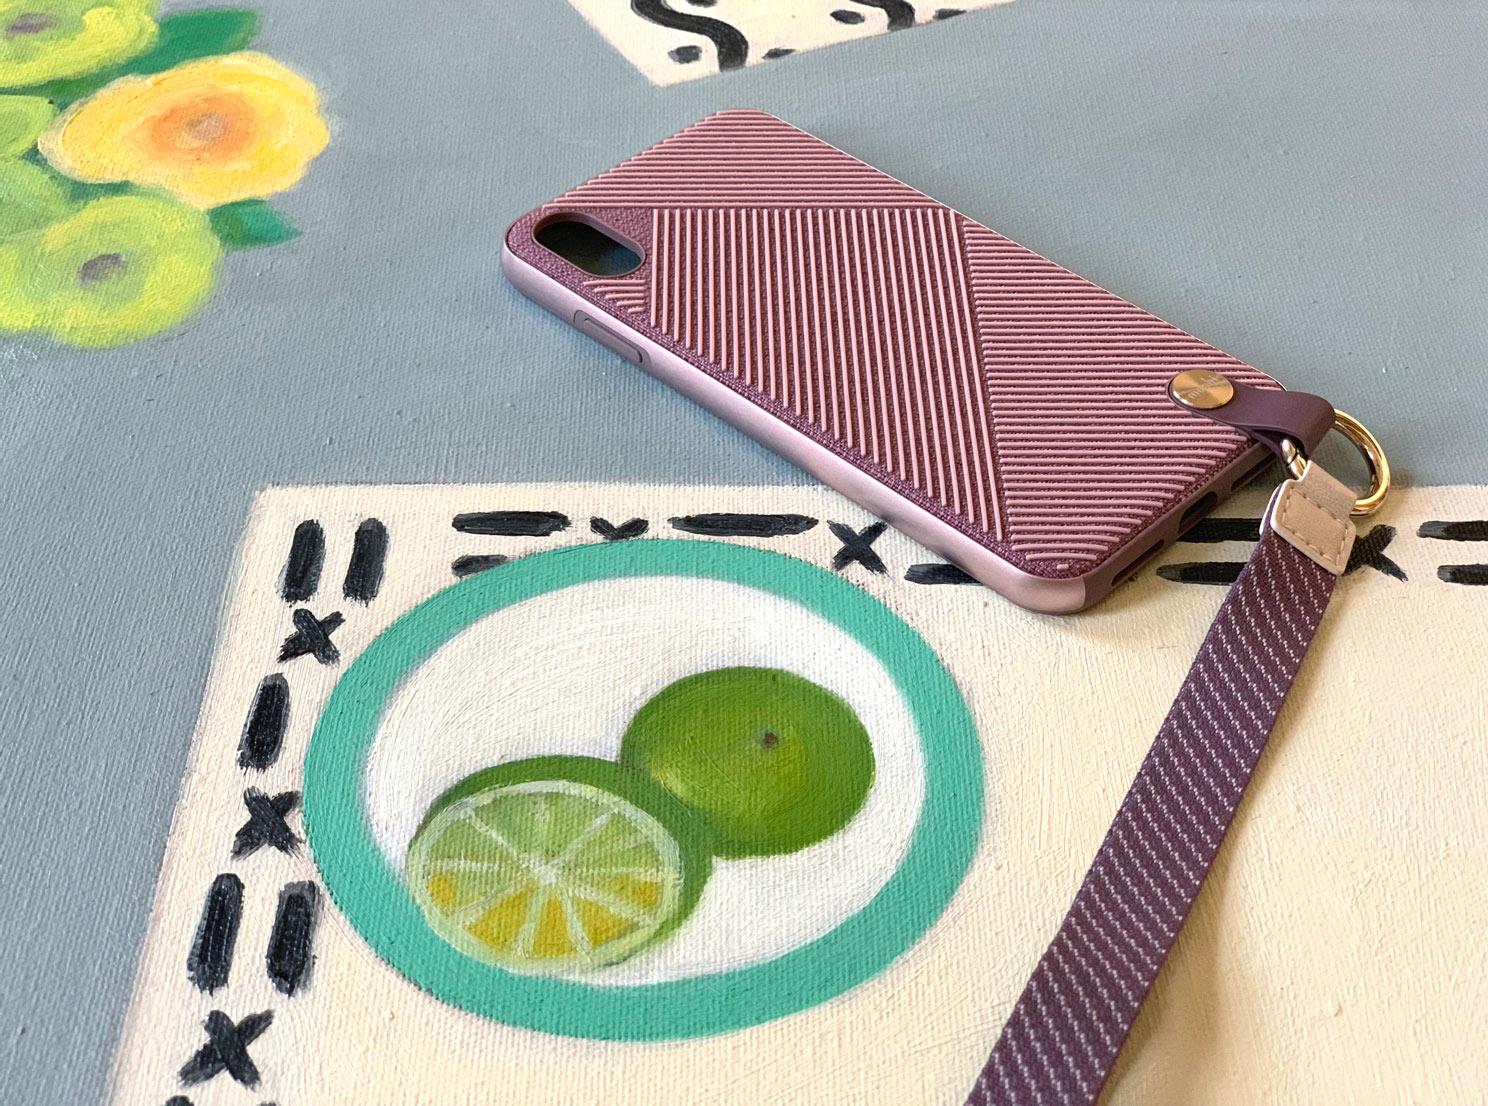 IPhone-XS-Max-Moshi-Altra-Case-Strap-Giselle-Ayupova-Painting-Tea-Chocolate-Cake-closeup.jpg